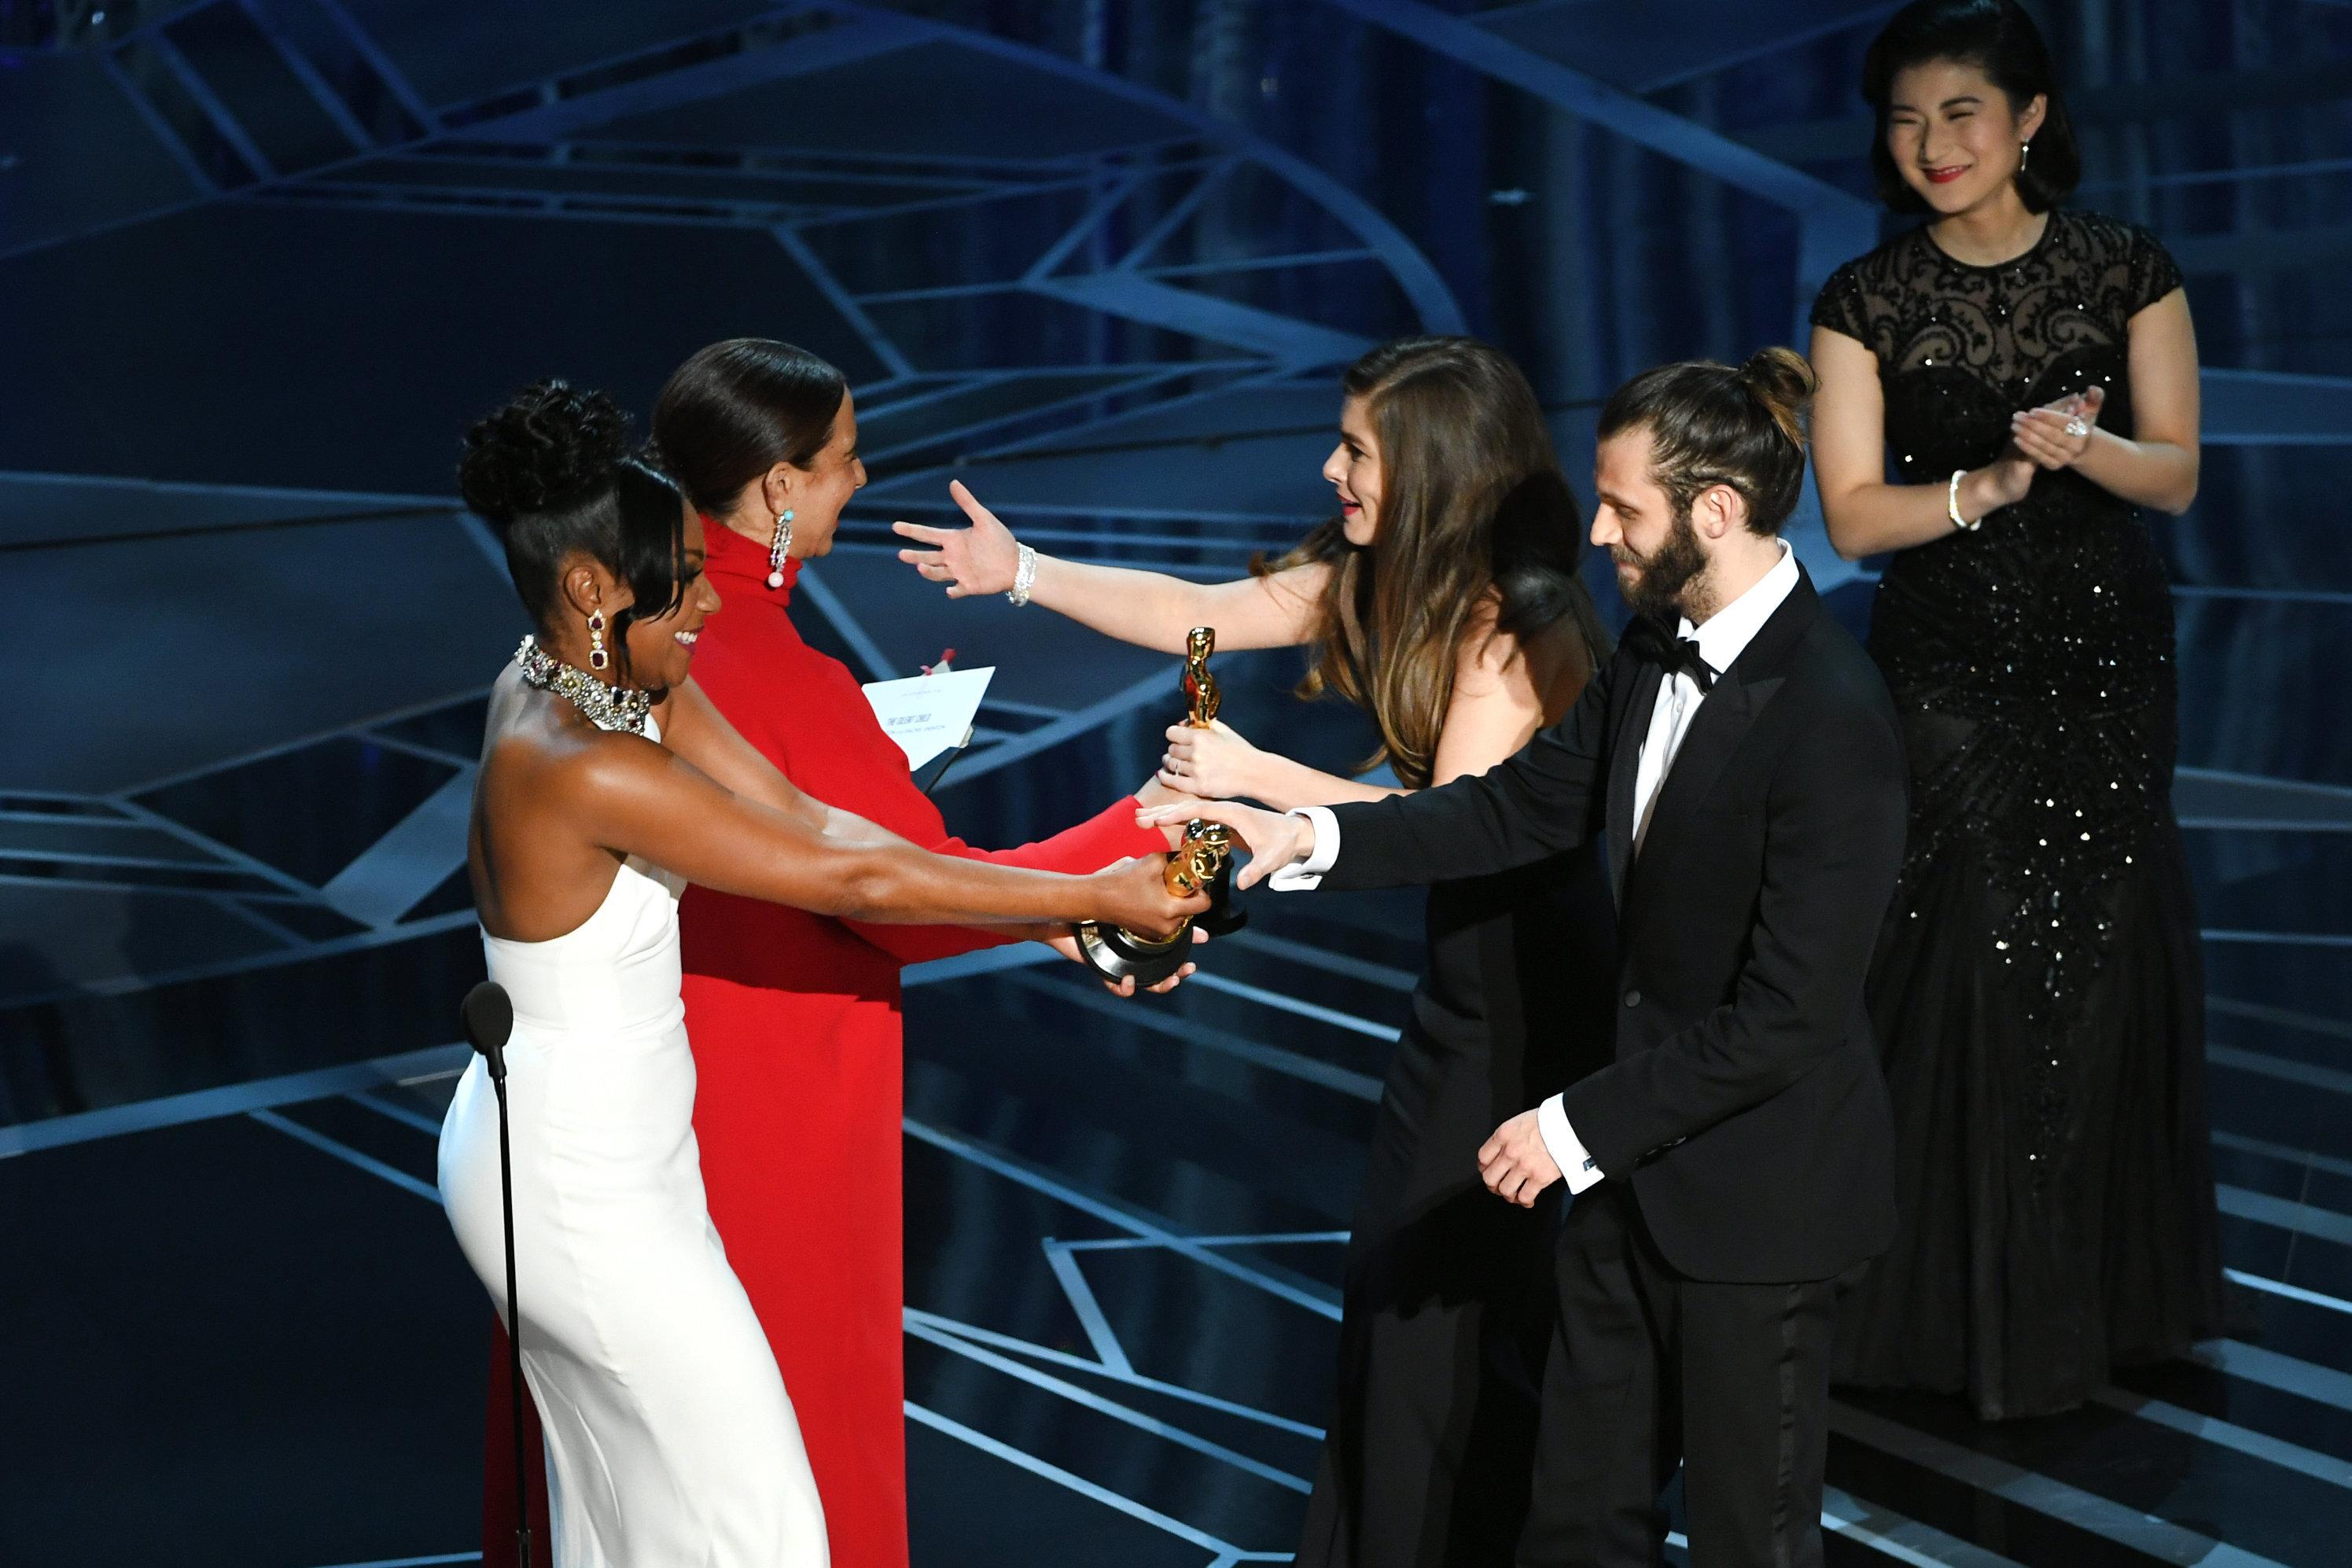 Oscar win for film highlighting struggles of deaf children at school